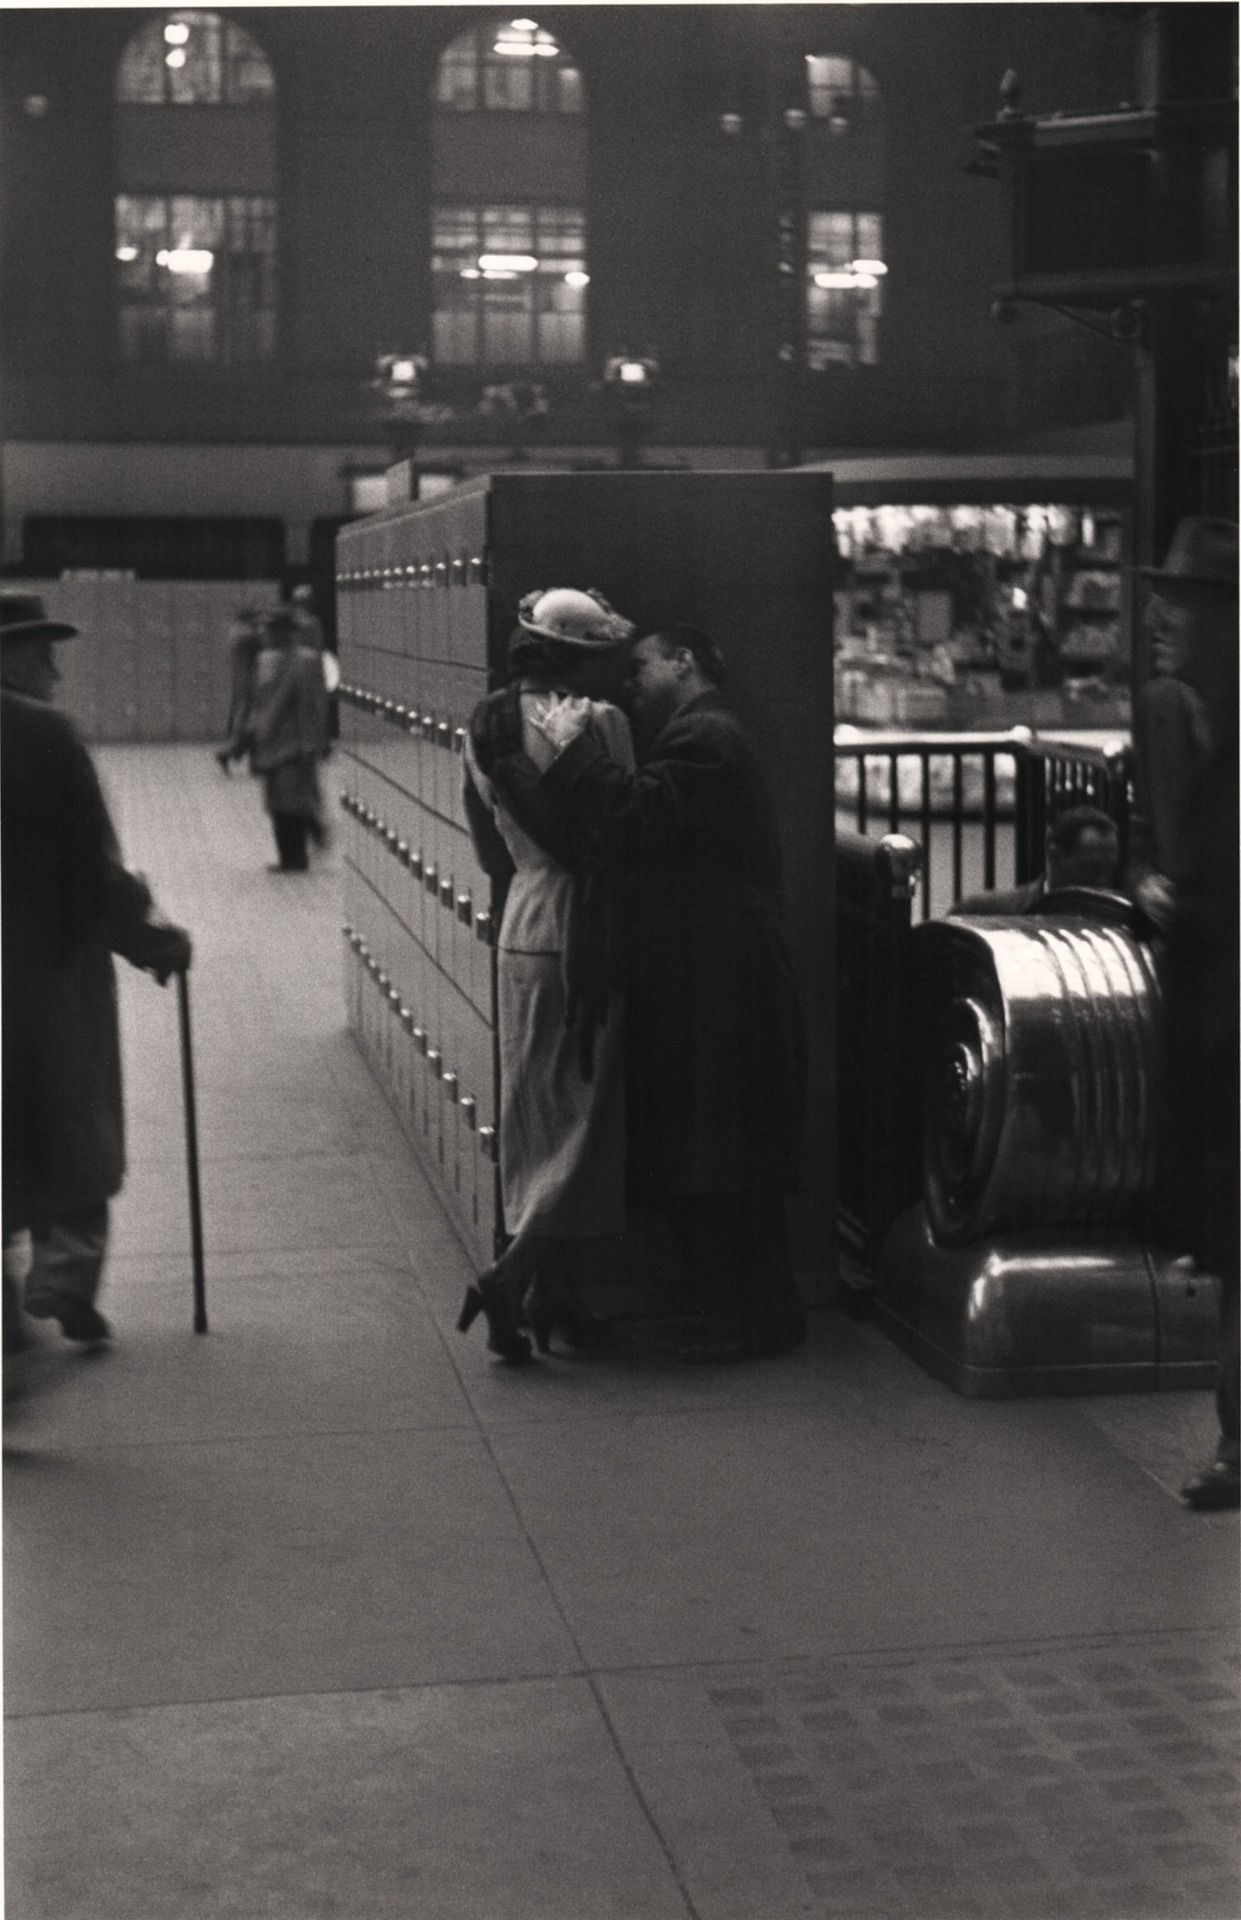 Pennsylvania Station, New York, 1946-47  photo byLouis Faurer